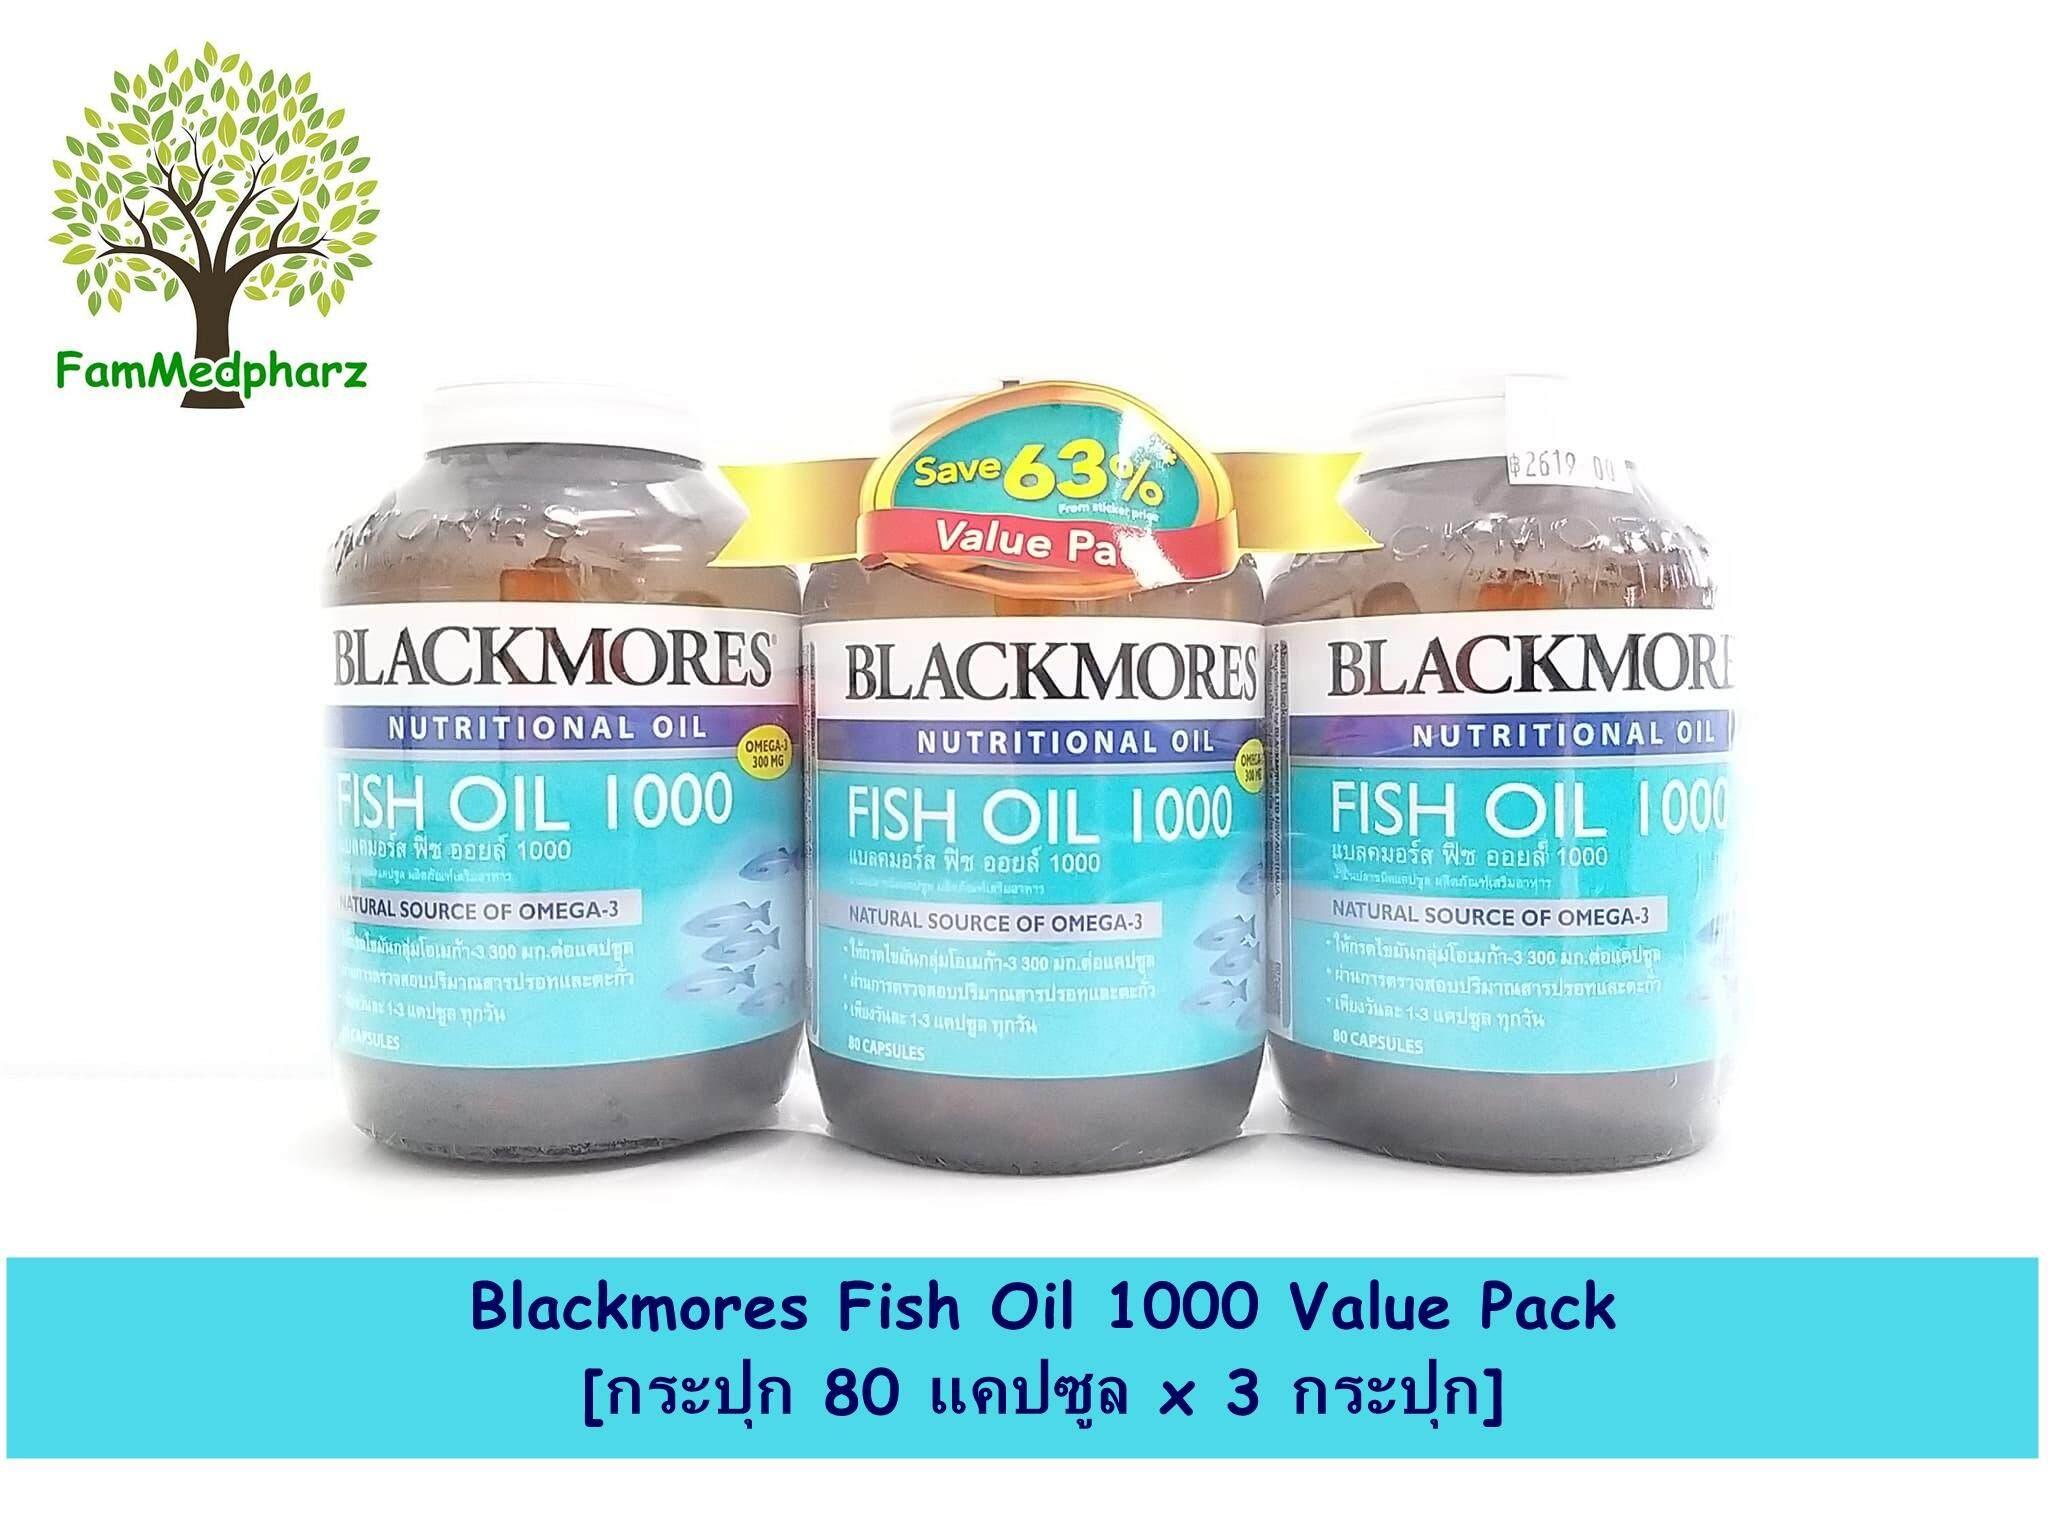 Blackmores Fish Oil 1000 Mg. Value Pack (80 Caps X 3 กระปุก) น้ำมันปลาชนิดแคปซูล โอเมก้า 3 ทำจากปลาแอนโชวี่ในทะเลน้ำลึกและเย็น ซึ่งให้ โอเมก้า-3 คุณภาพดี.